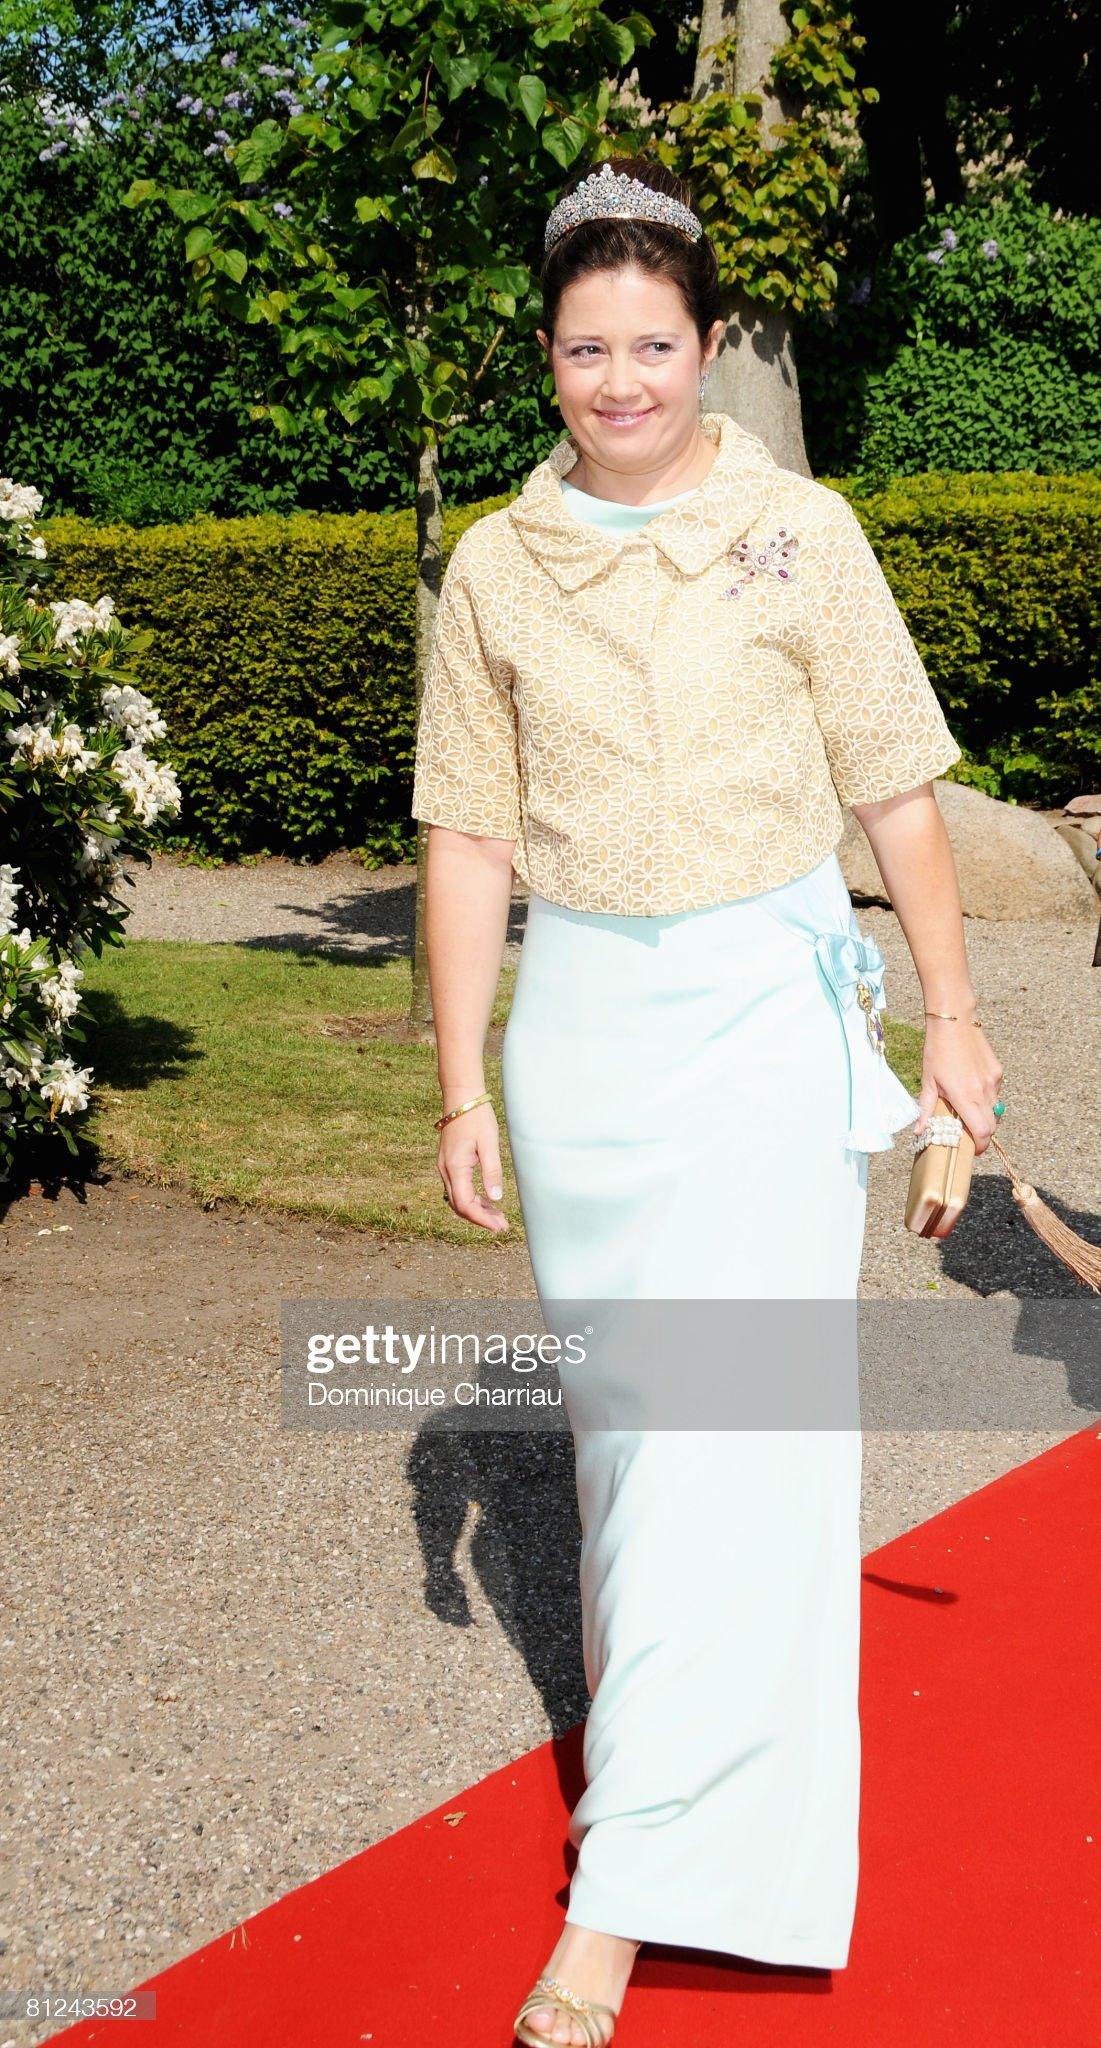 Prince Joachim and Miss Marie Cavallier - Wedding : News Photo